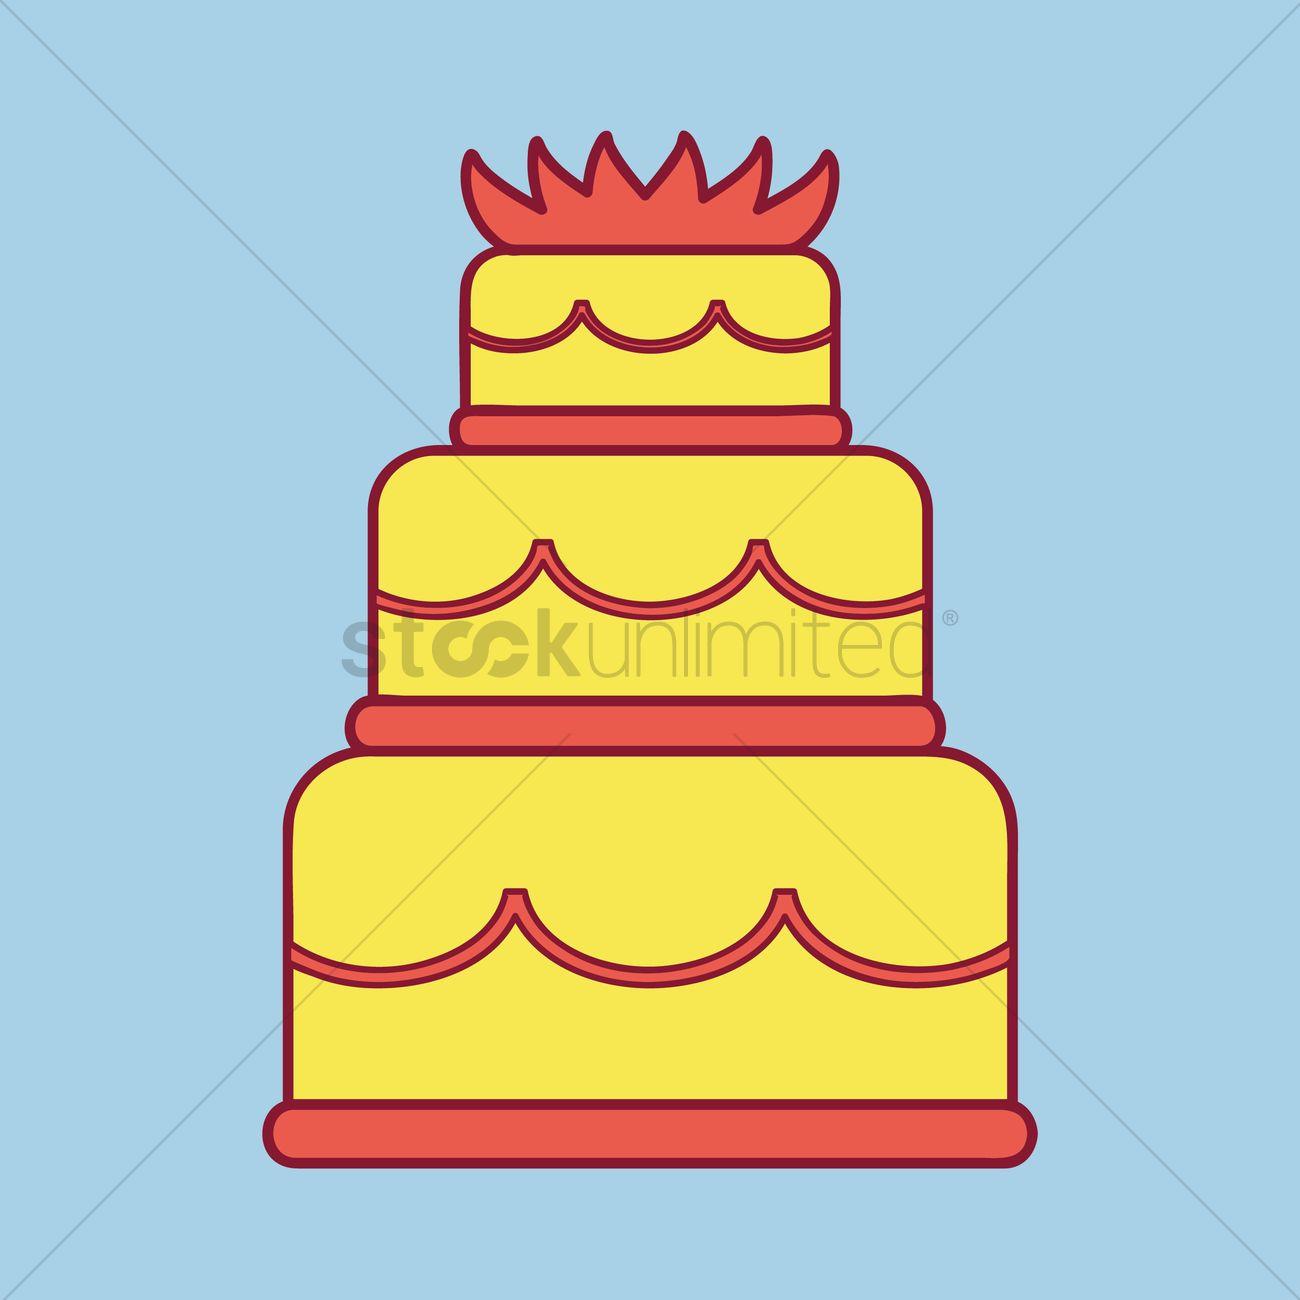 Wedding cake Vector Image - 1385243 | StockUnlimited